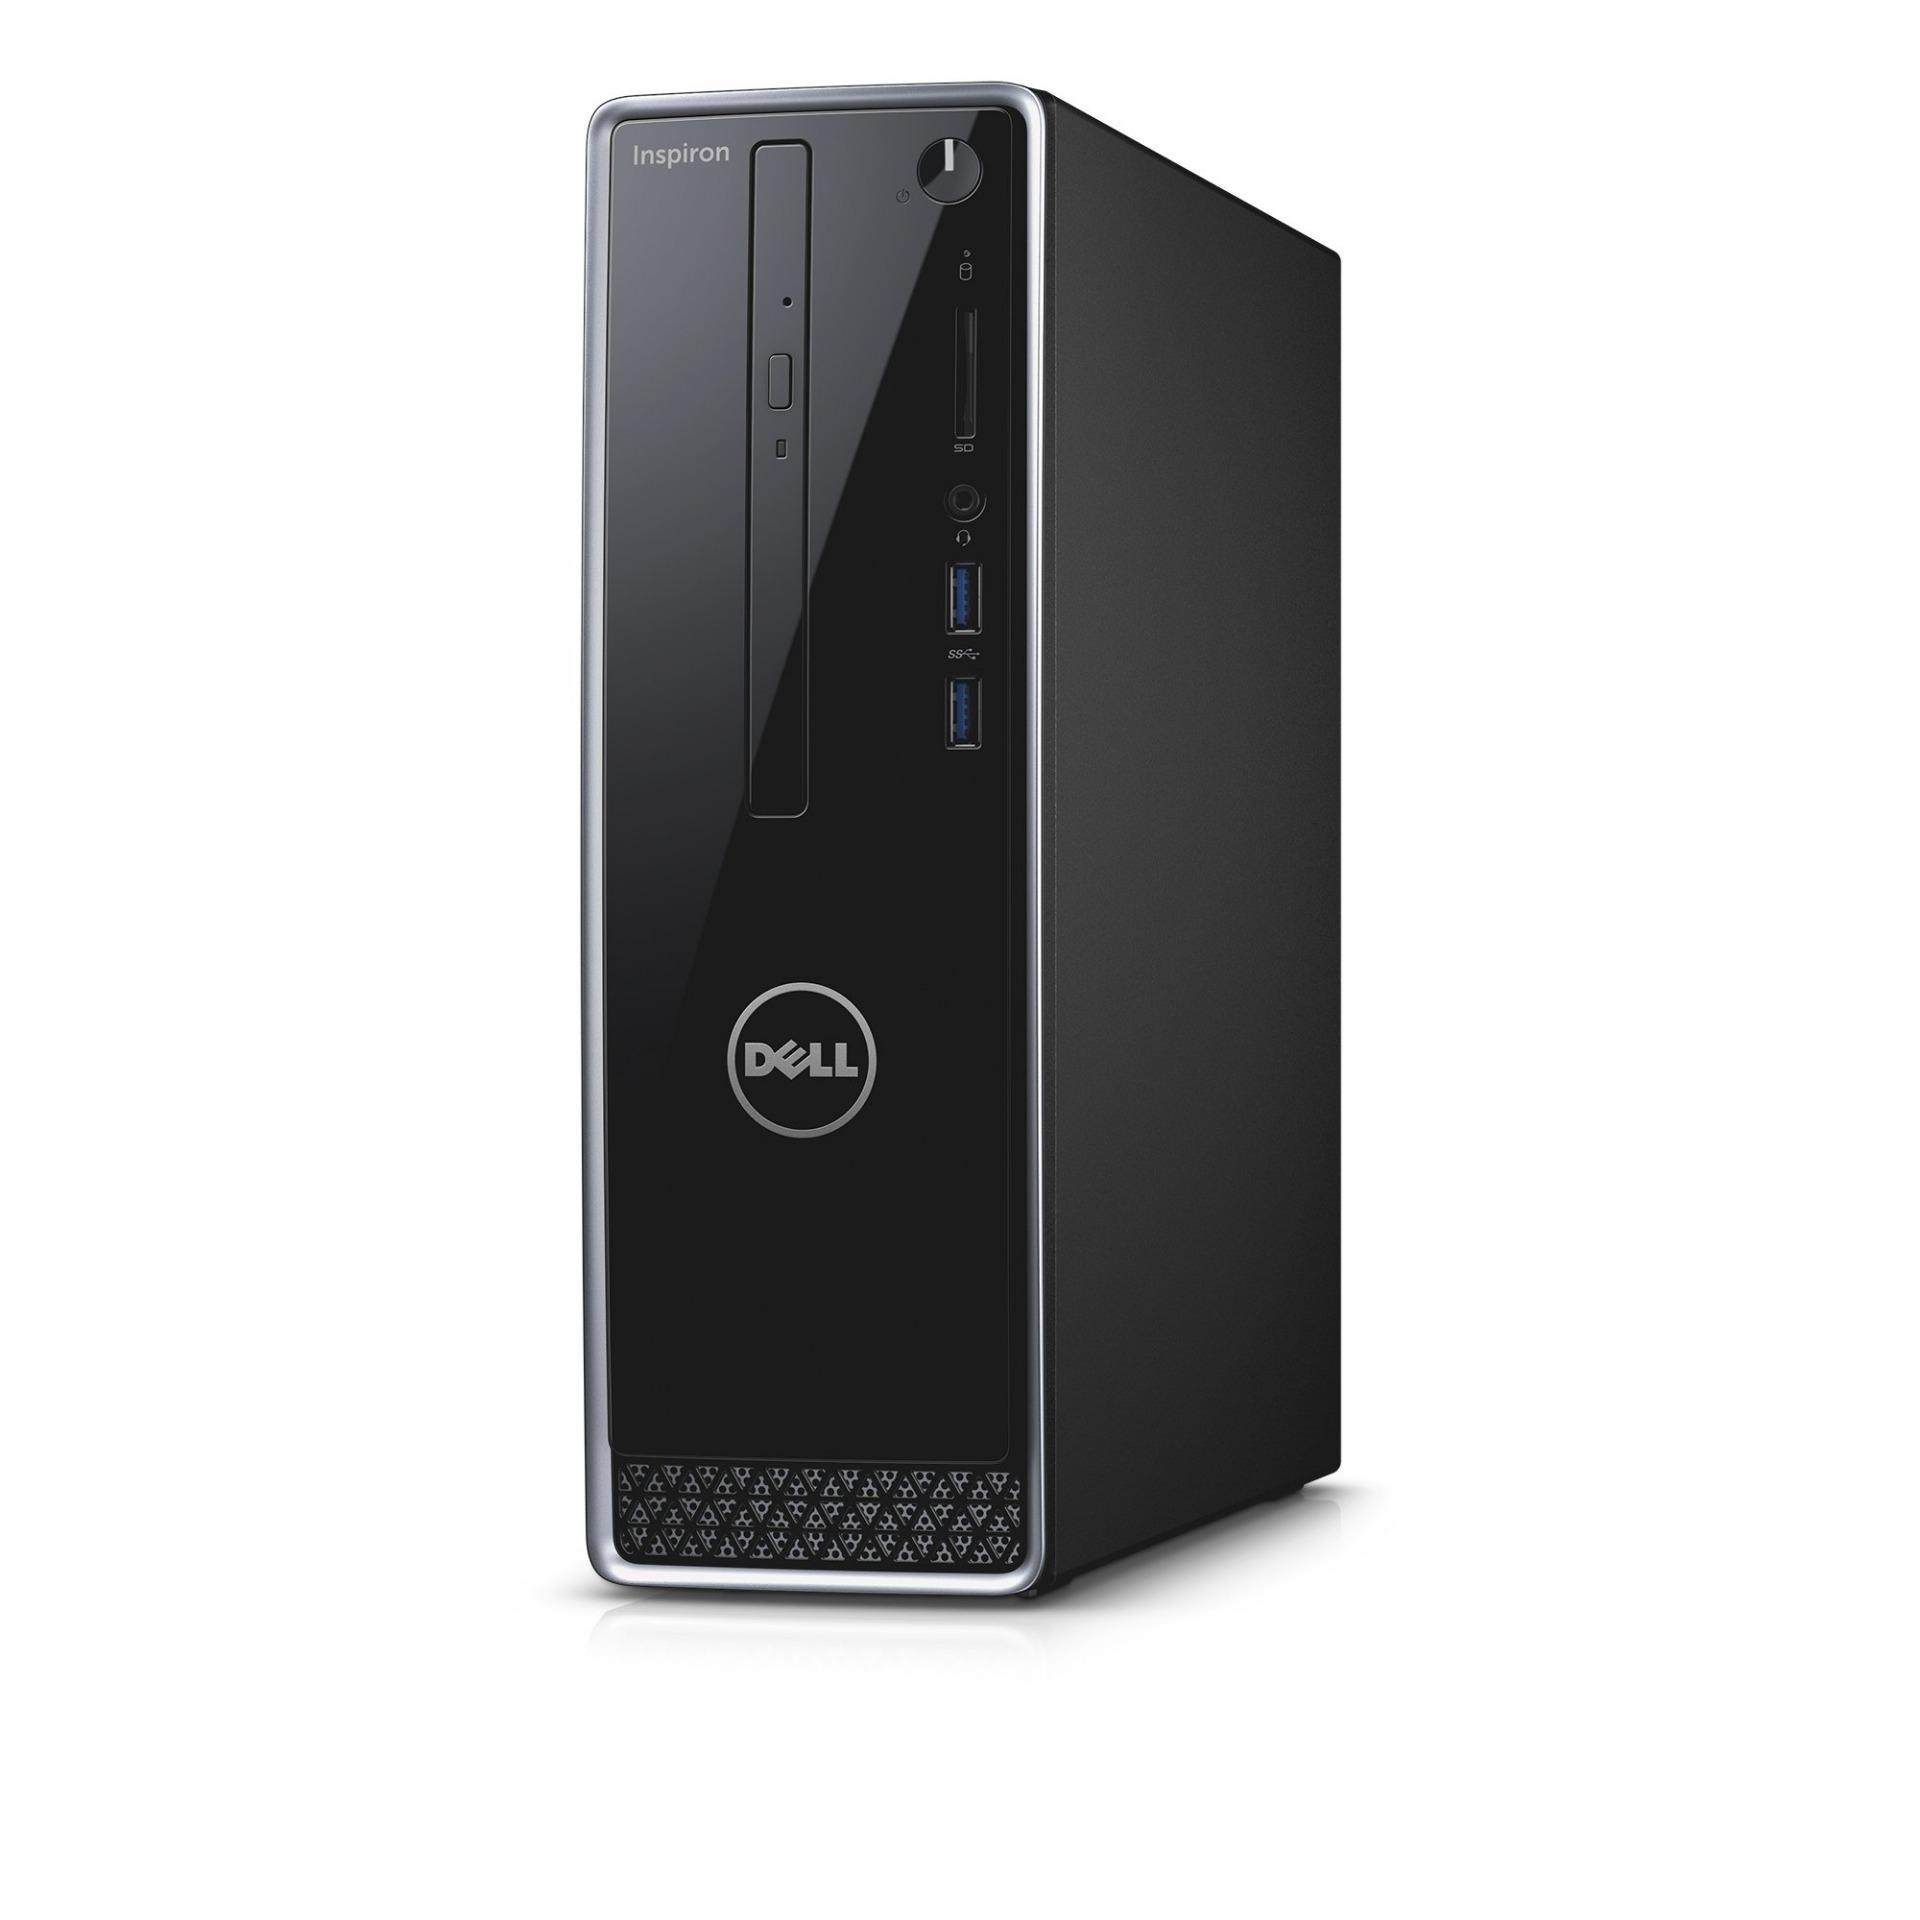 INSPIRON SMALL DESKTOP 3268 New 7th Gen Intel Core i7 7700 8GB RAM 1TBIntel HD Graphics 630 with shared graphics...